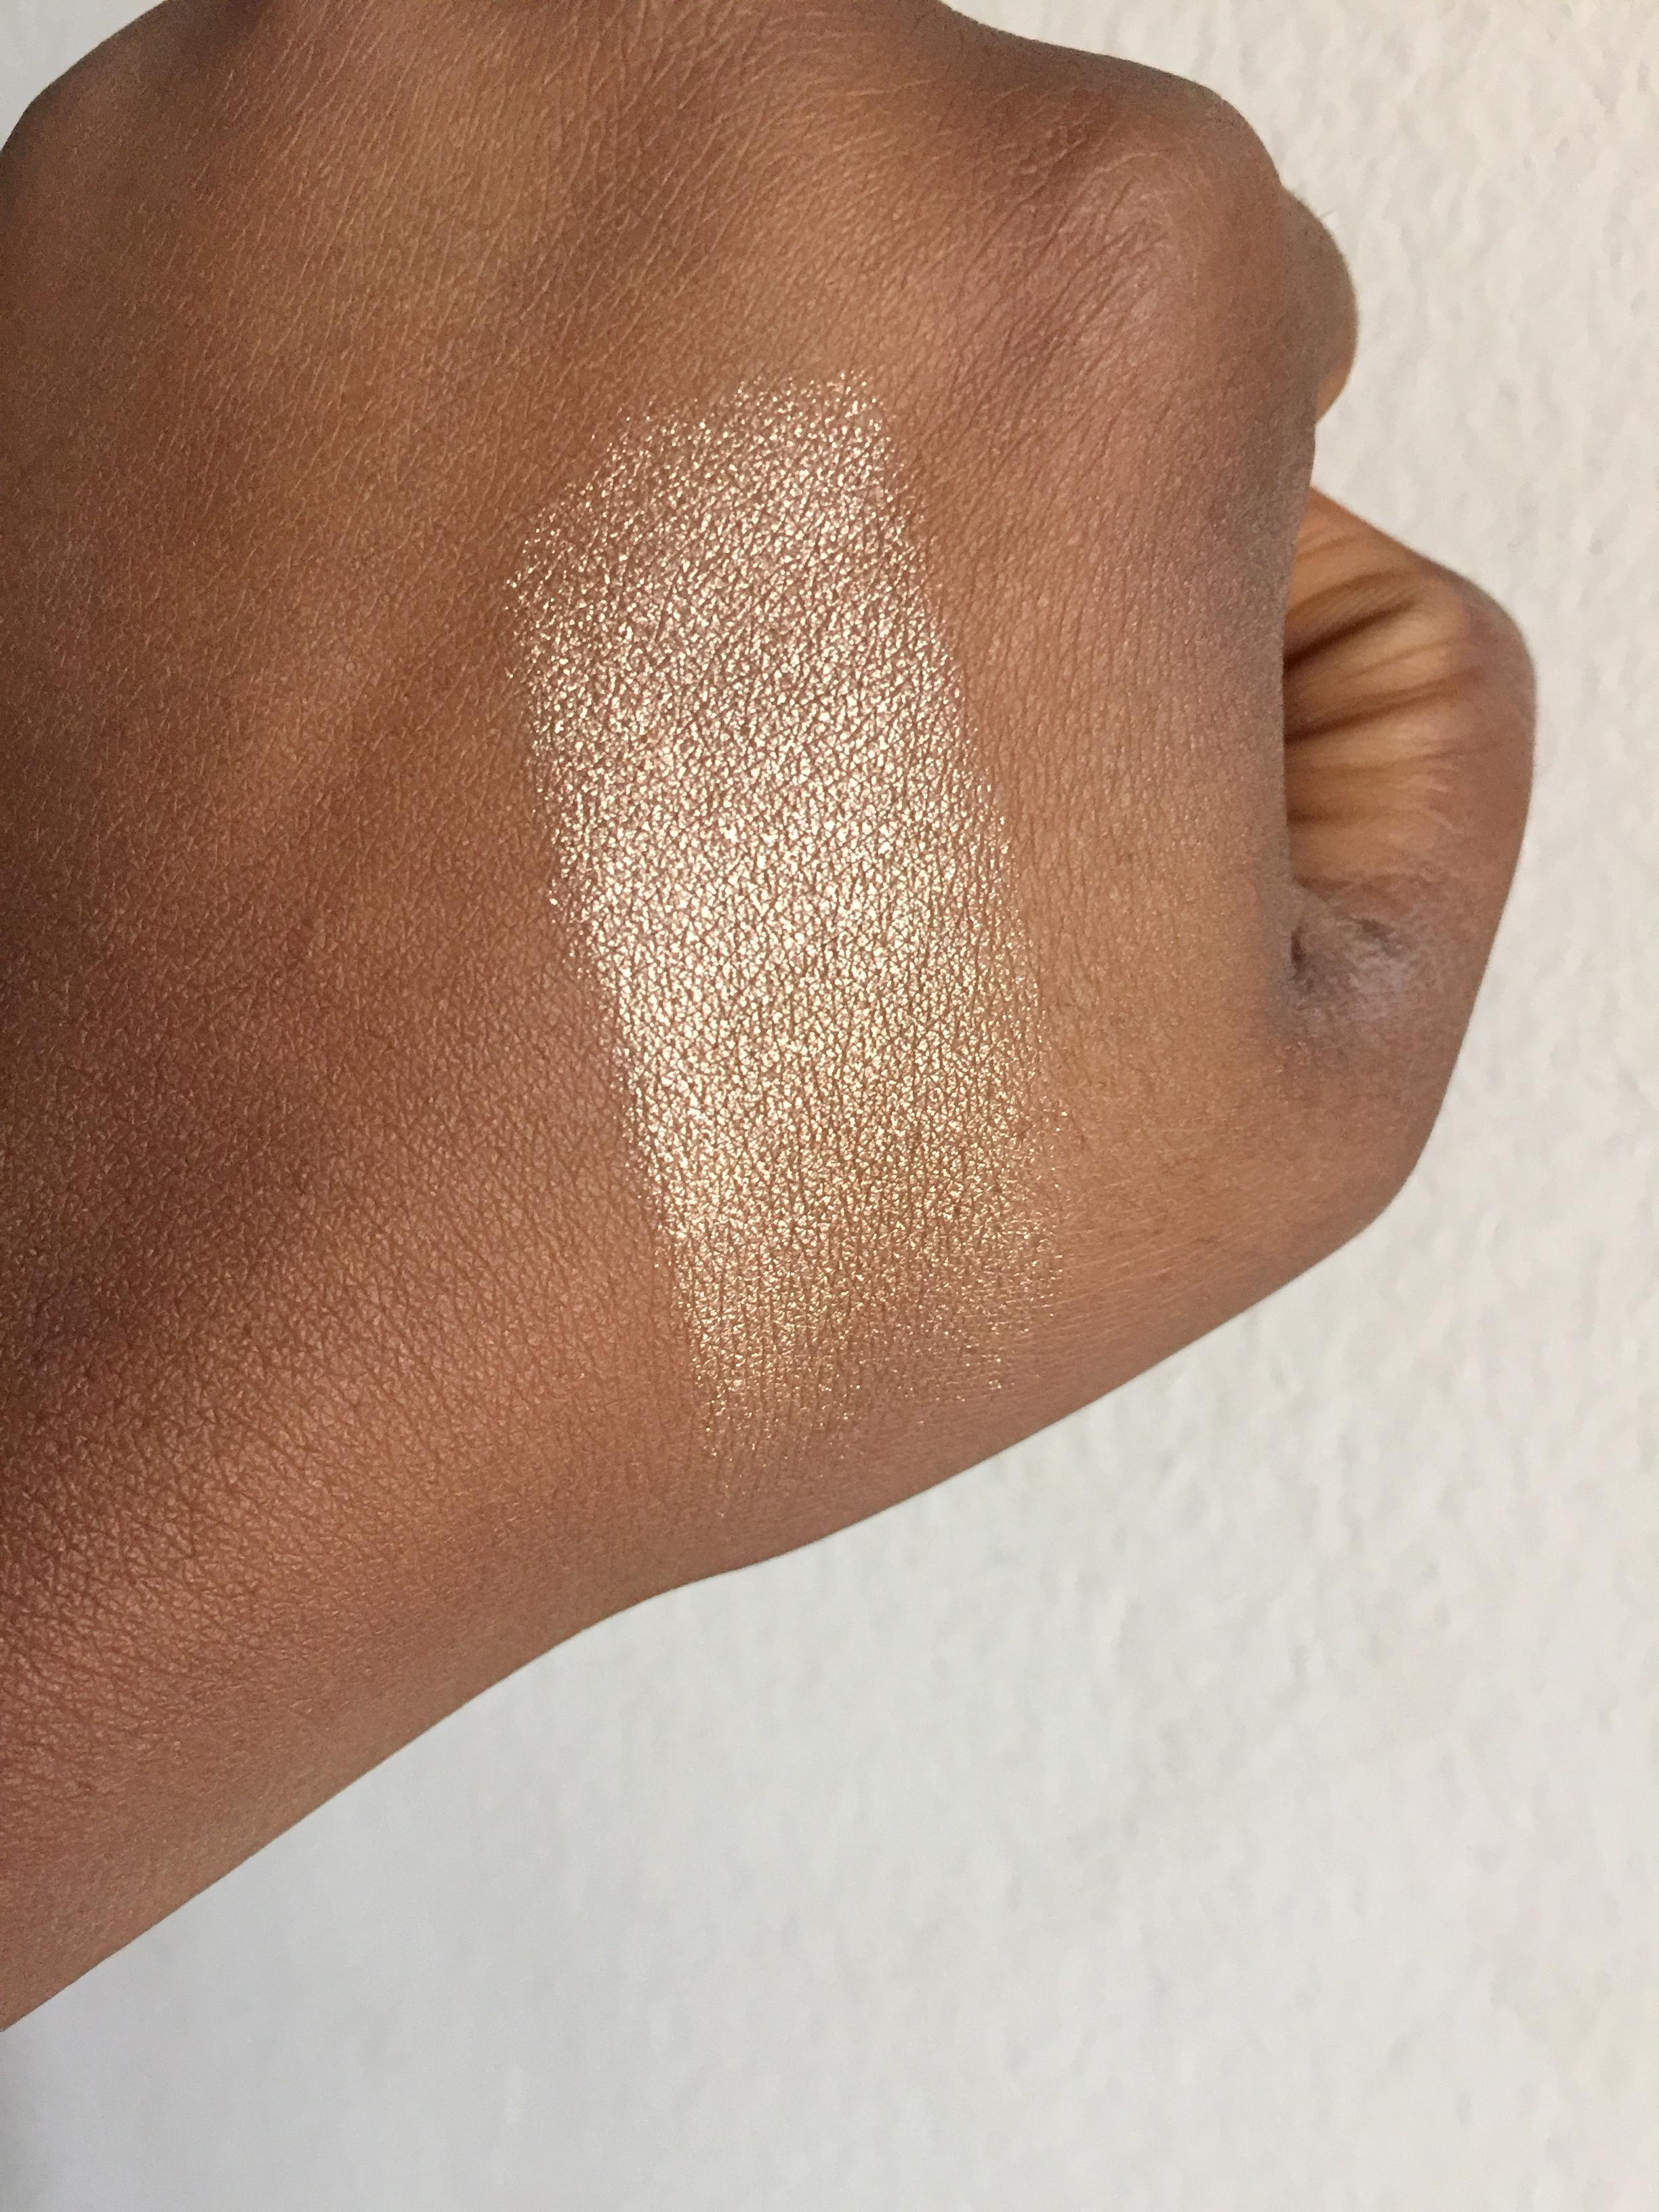 Pressed Powder by black radiance #19